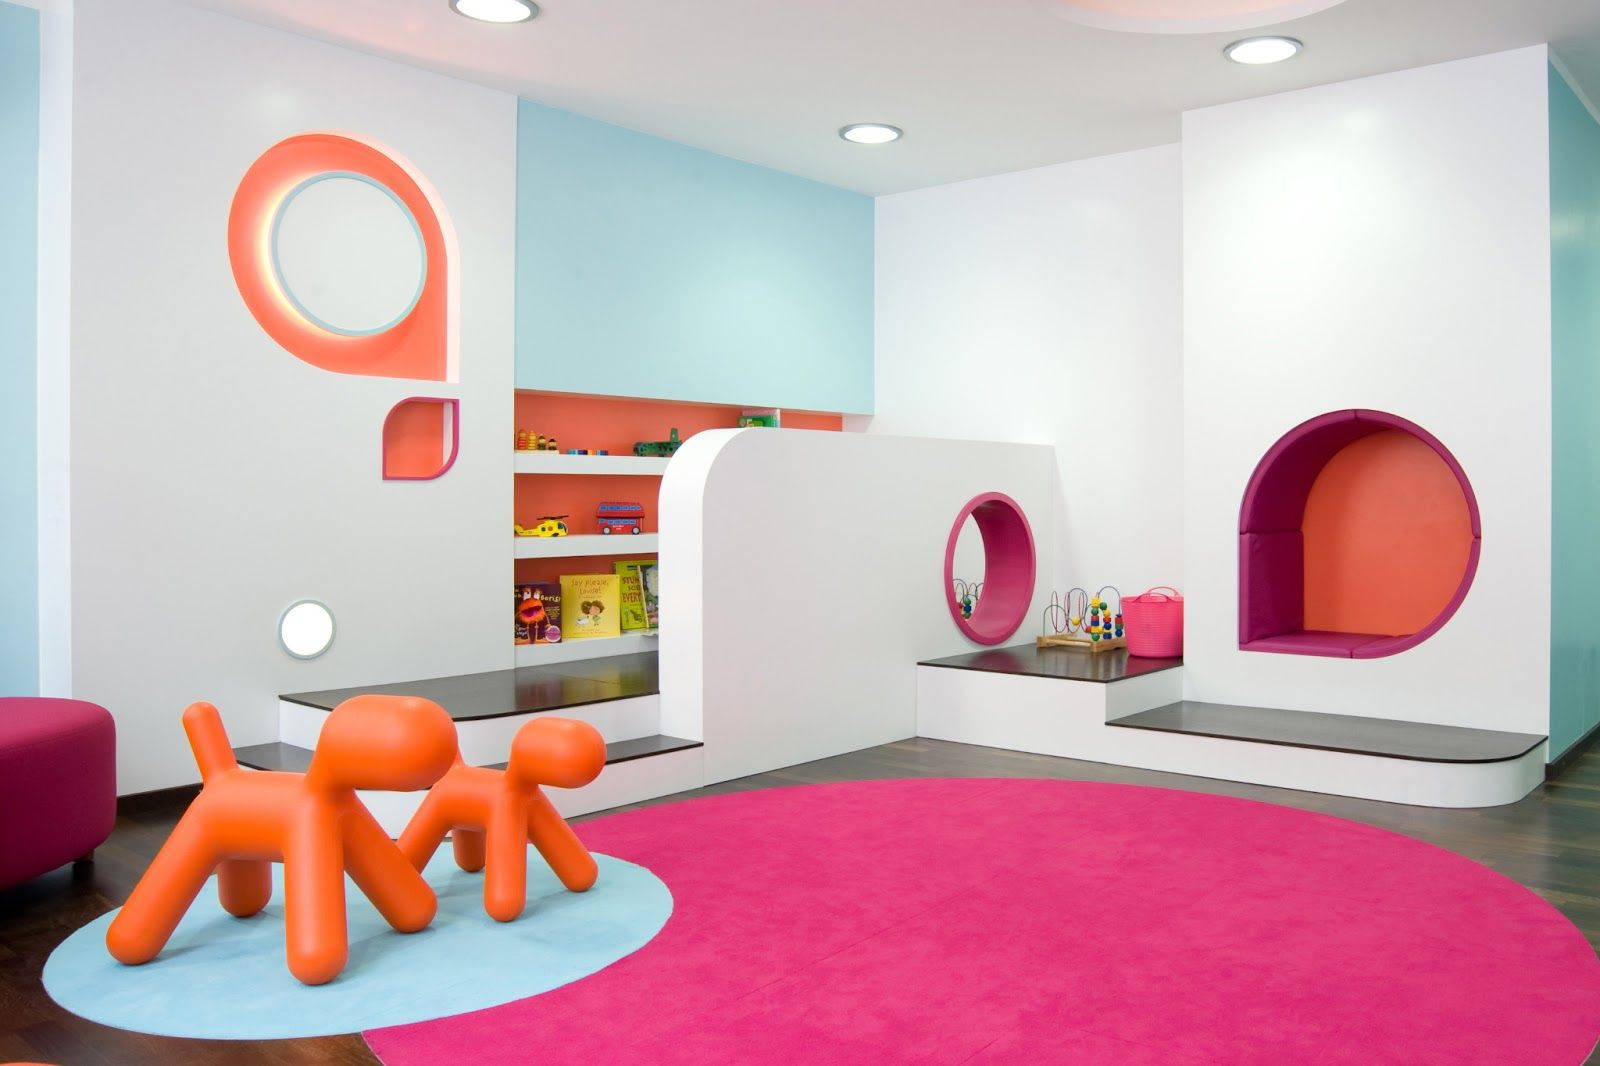 Online portfolio of architectural - Online portfolio interior design ...